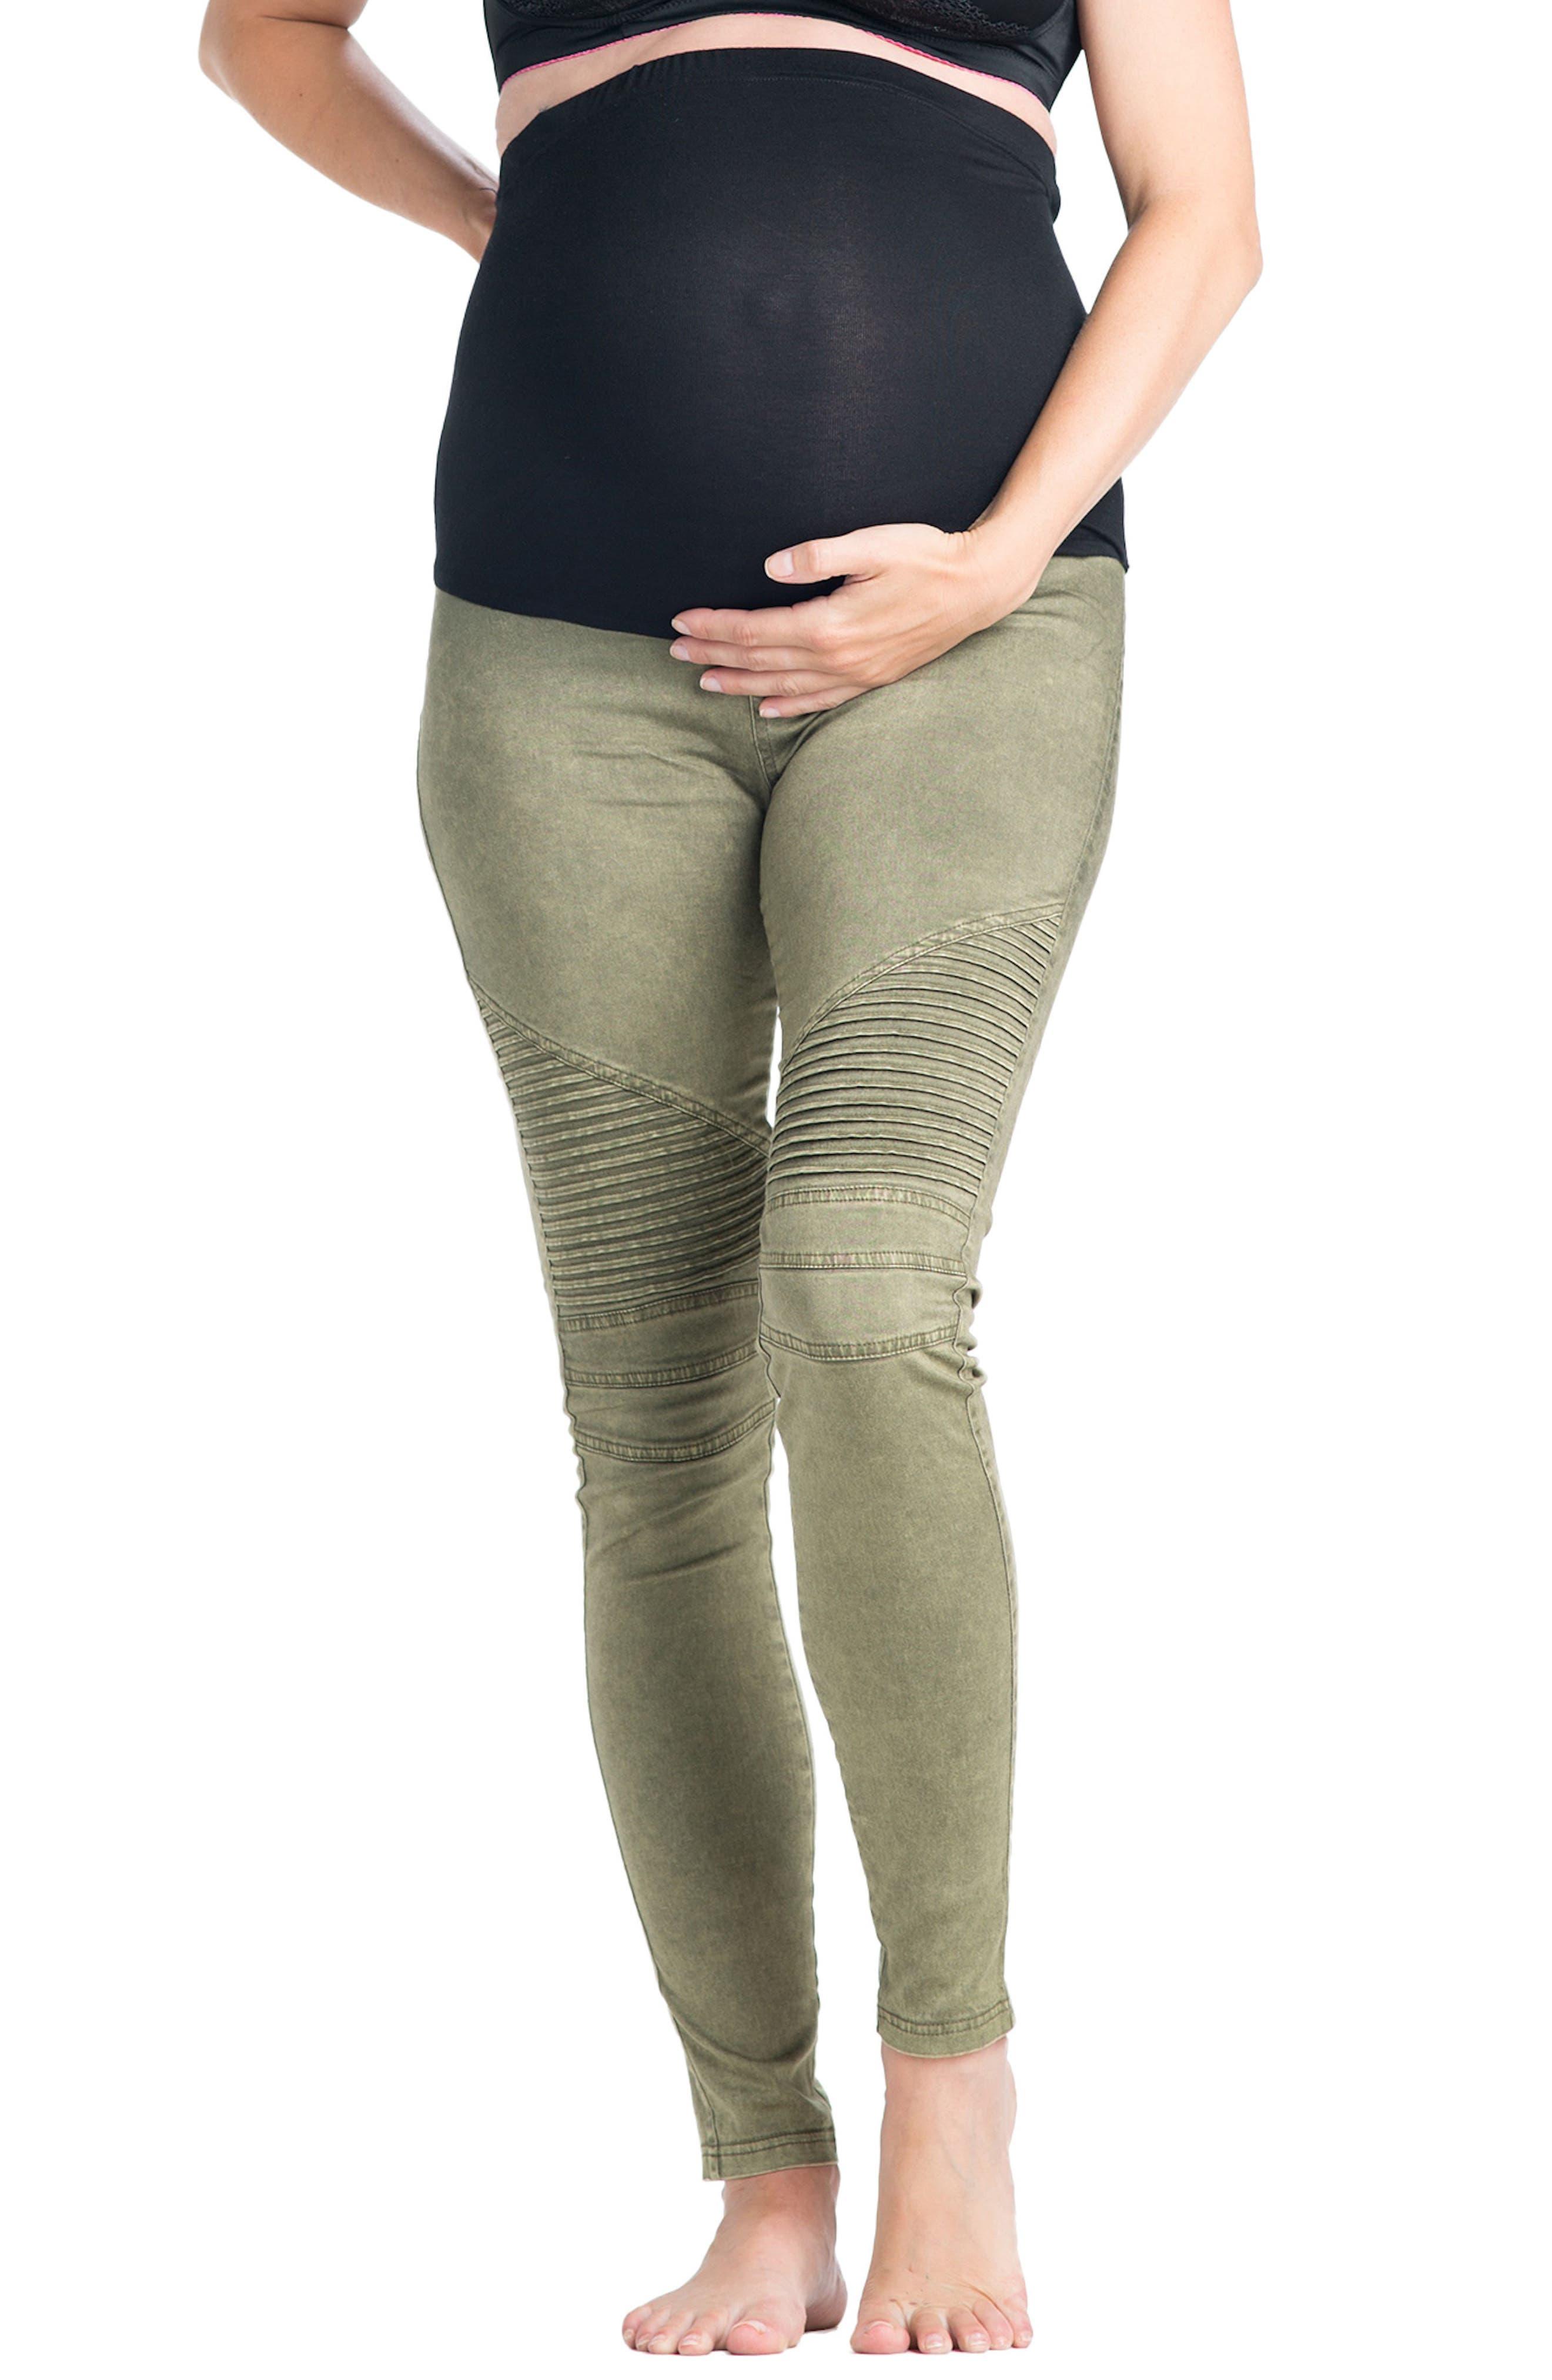 Main Image - Preggo Leggings Moto Maternity Leggings